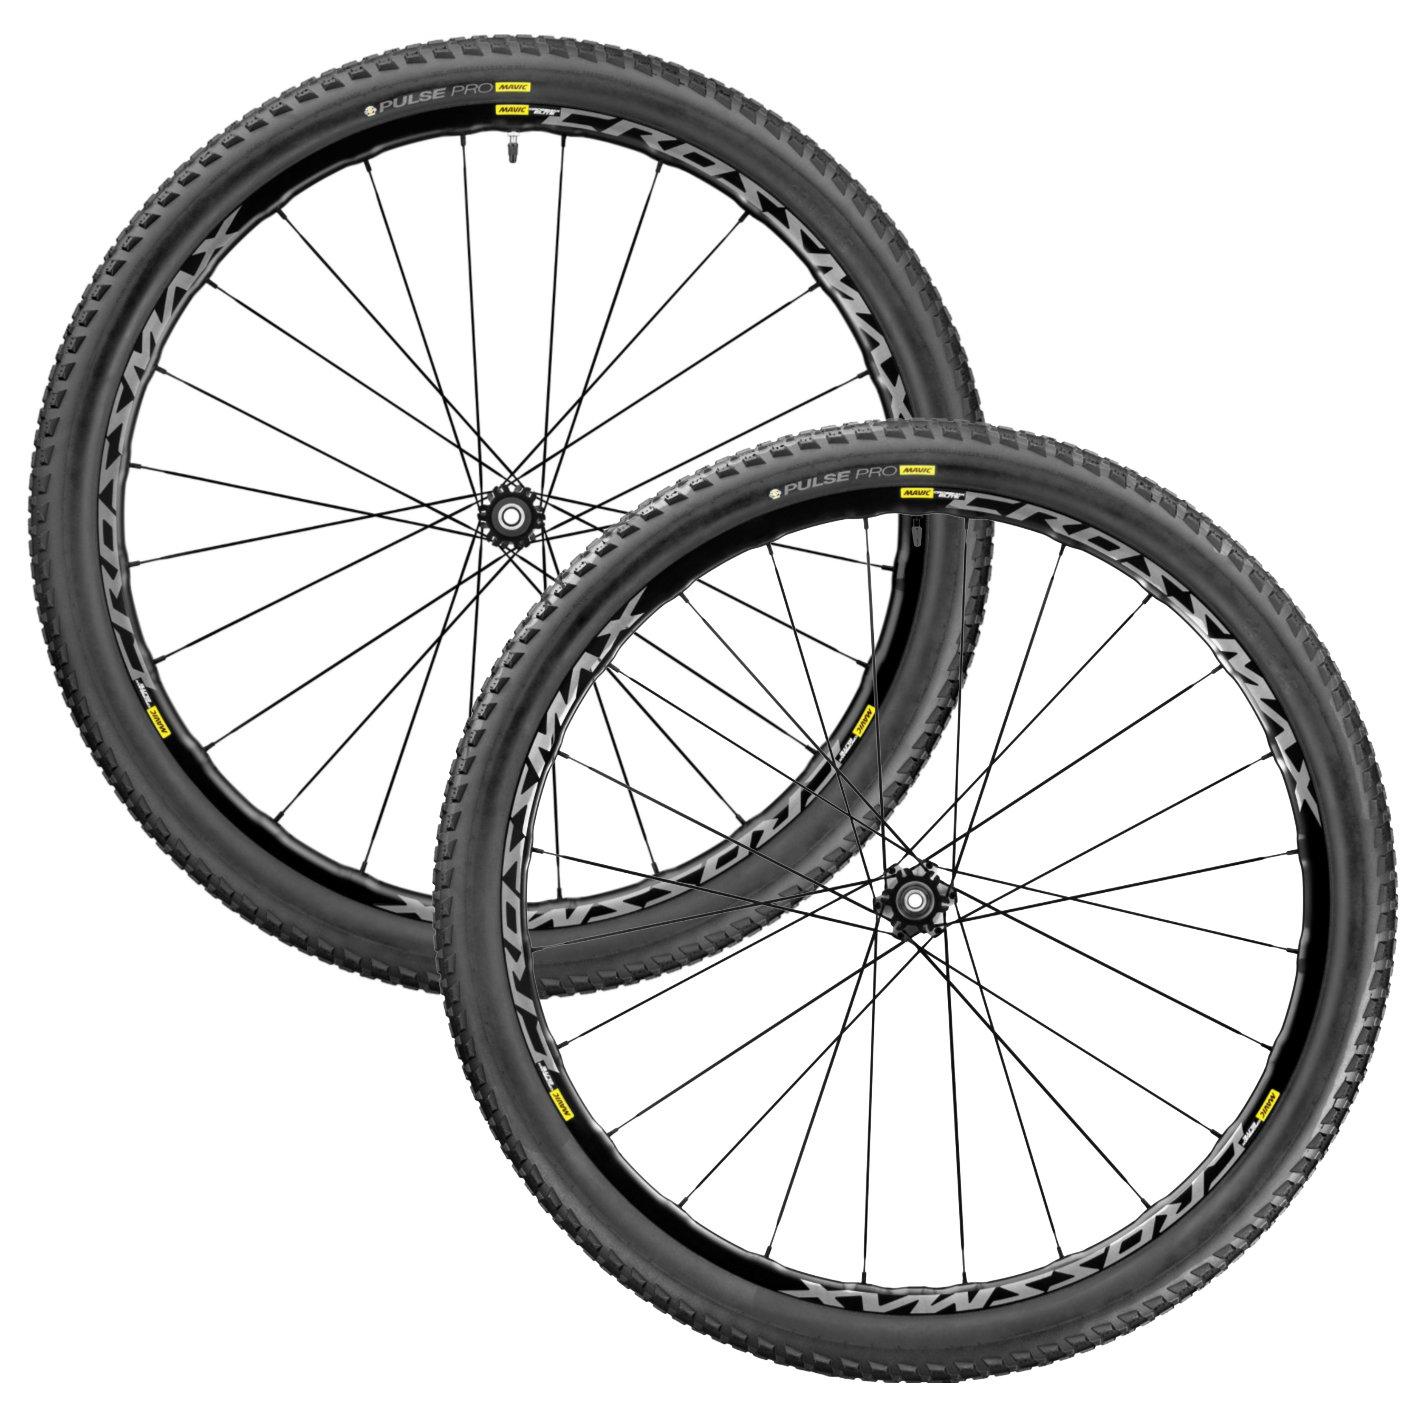 MAVIC(マビック) CROSSMAX ELITE Boost 27.5x2.25 MTB Wheelset 2017 - Black [Shimano/Sram] [並行輸入品] B07433QW4D